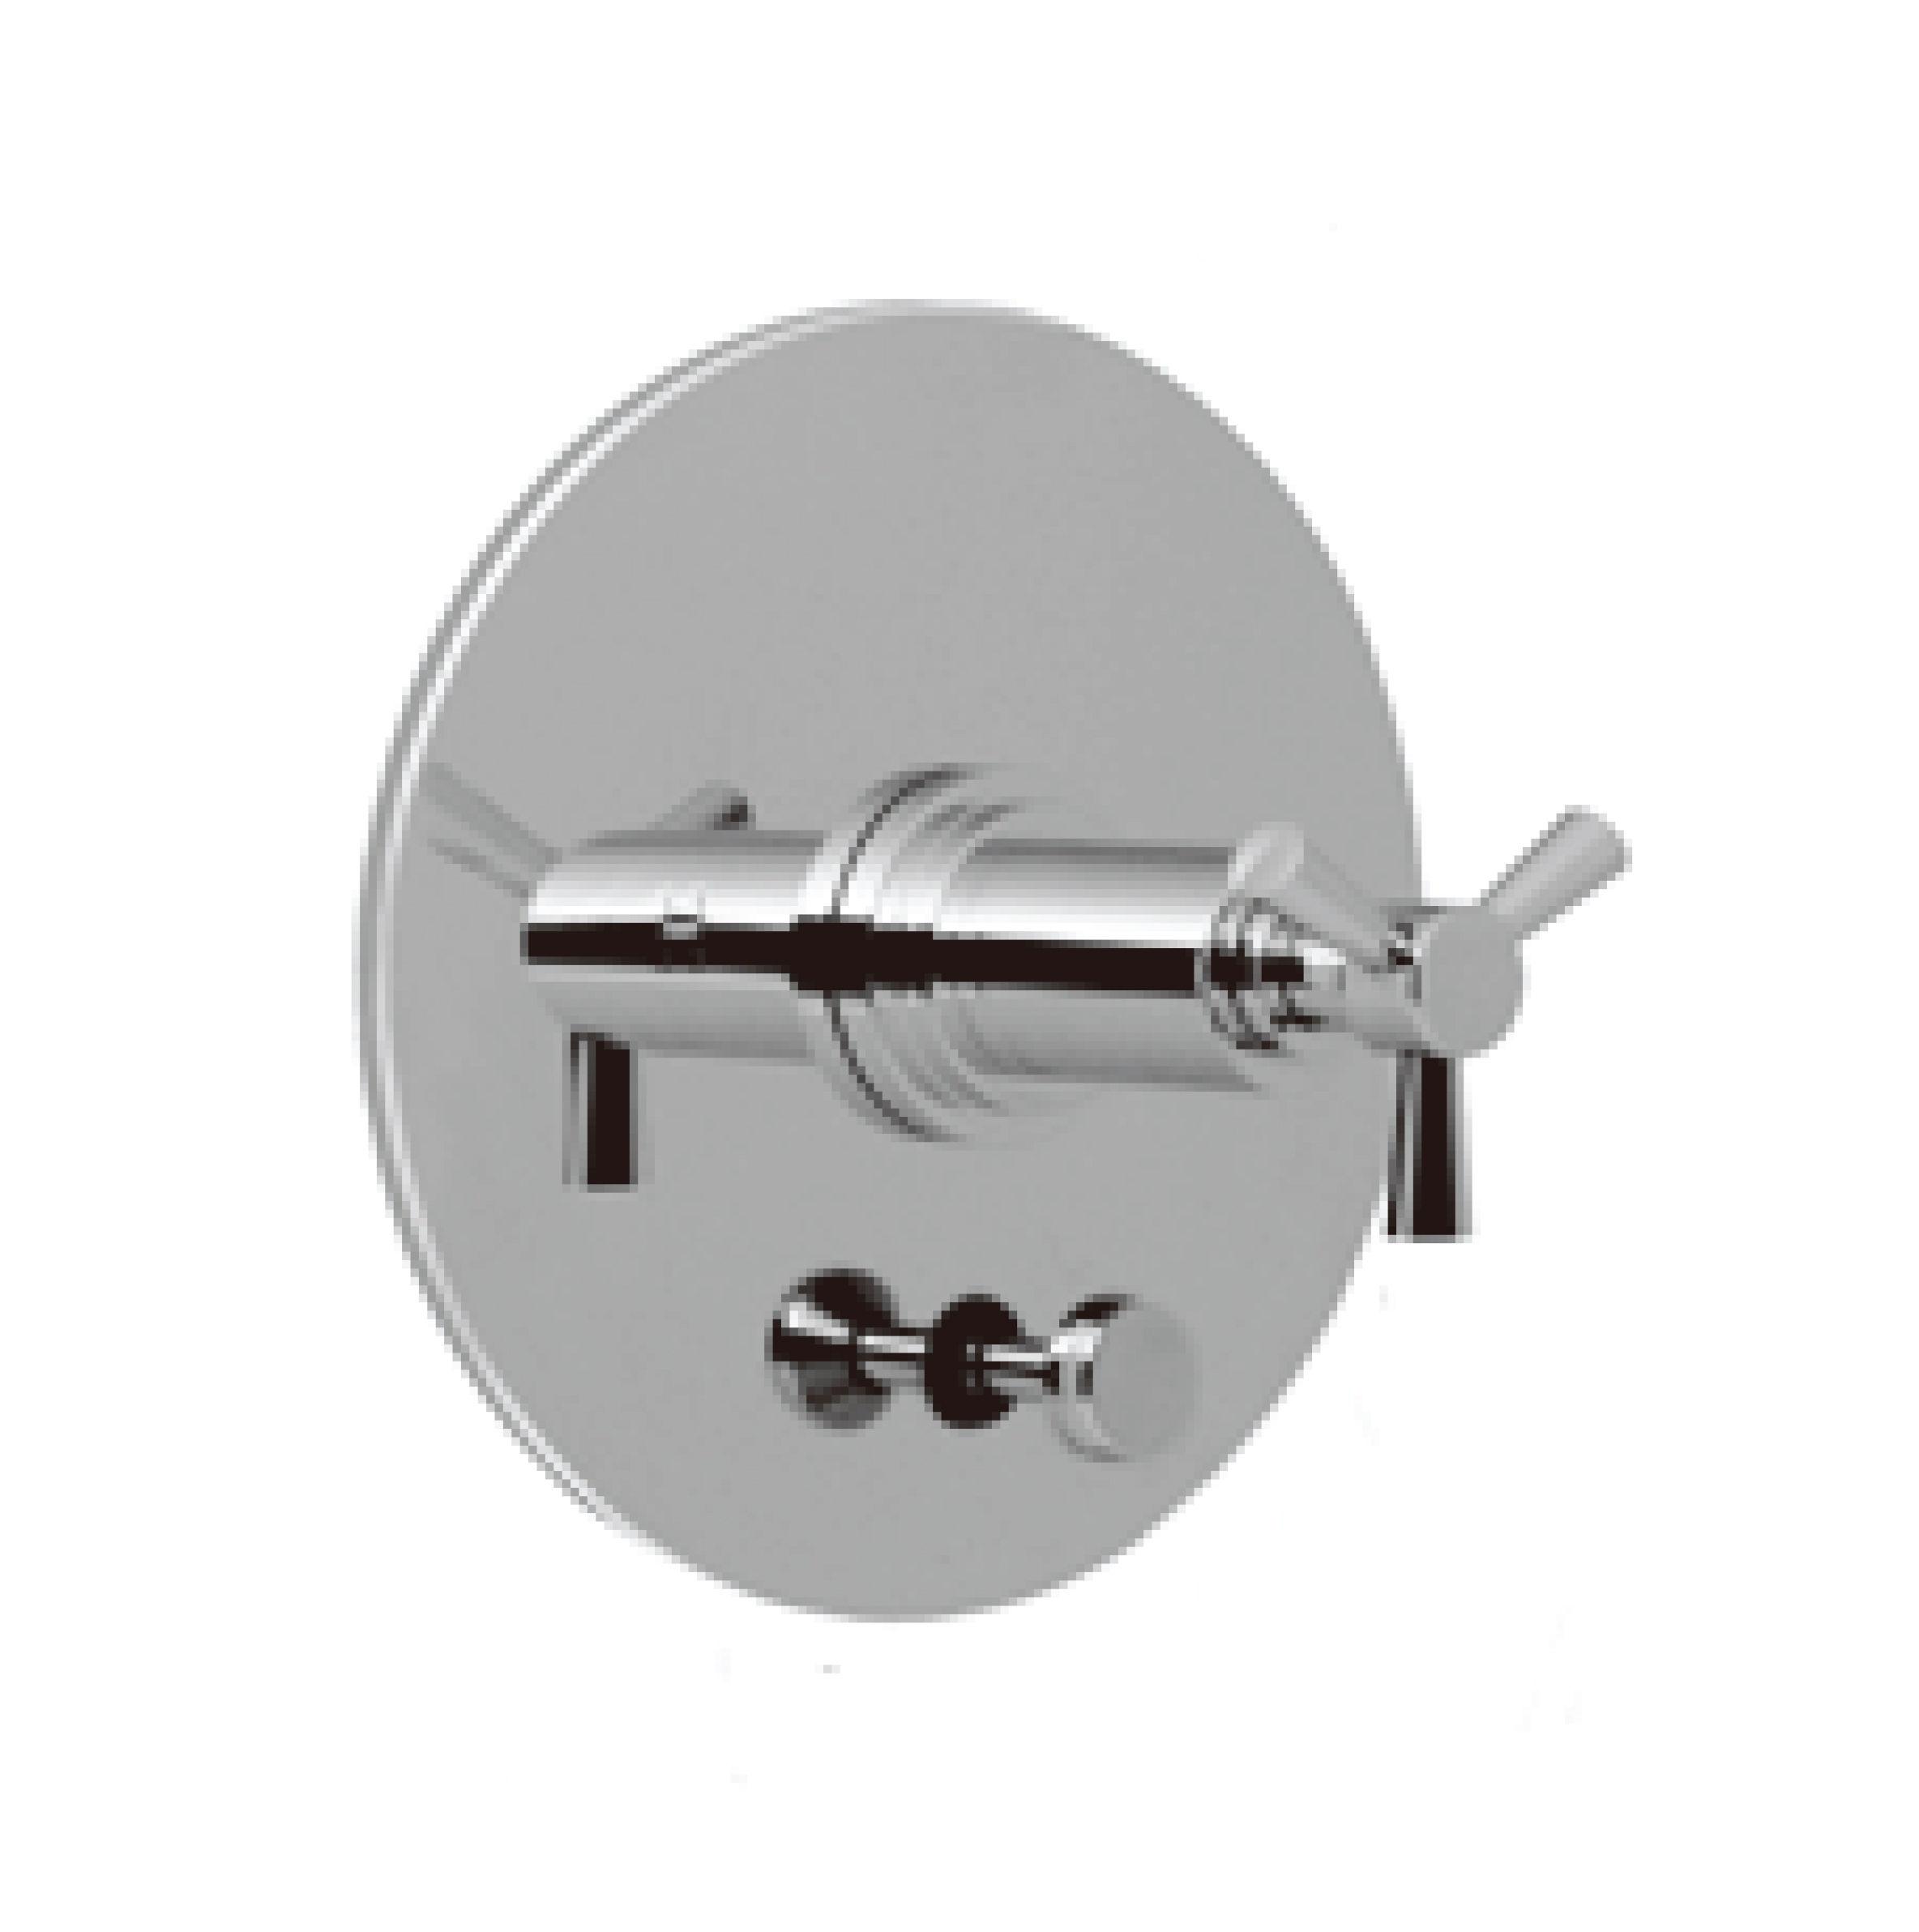 Santec 3535tx Tm Pressure Balance Tub Shower Trim Only